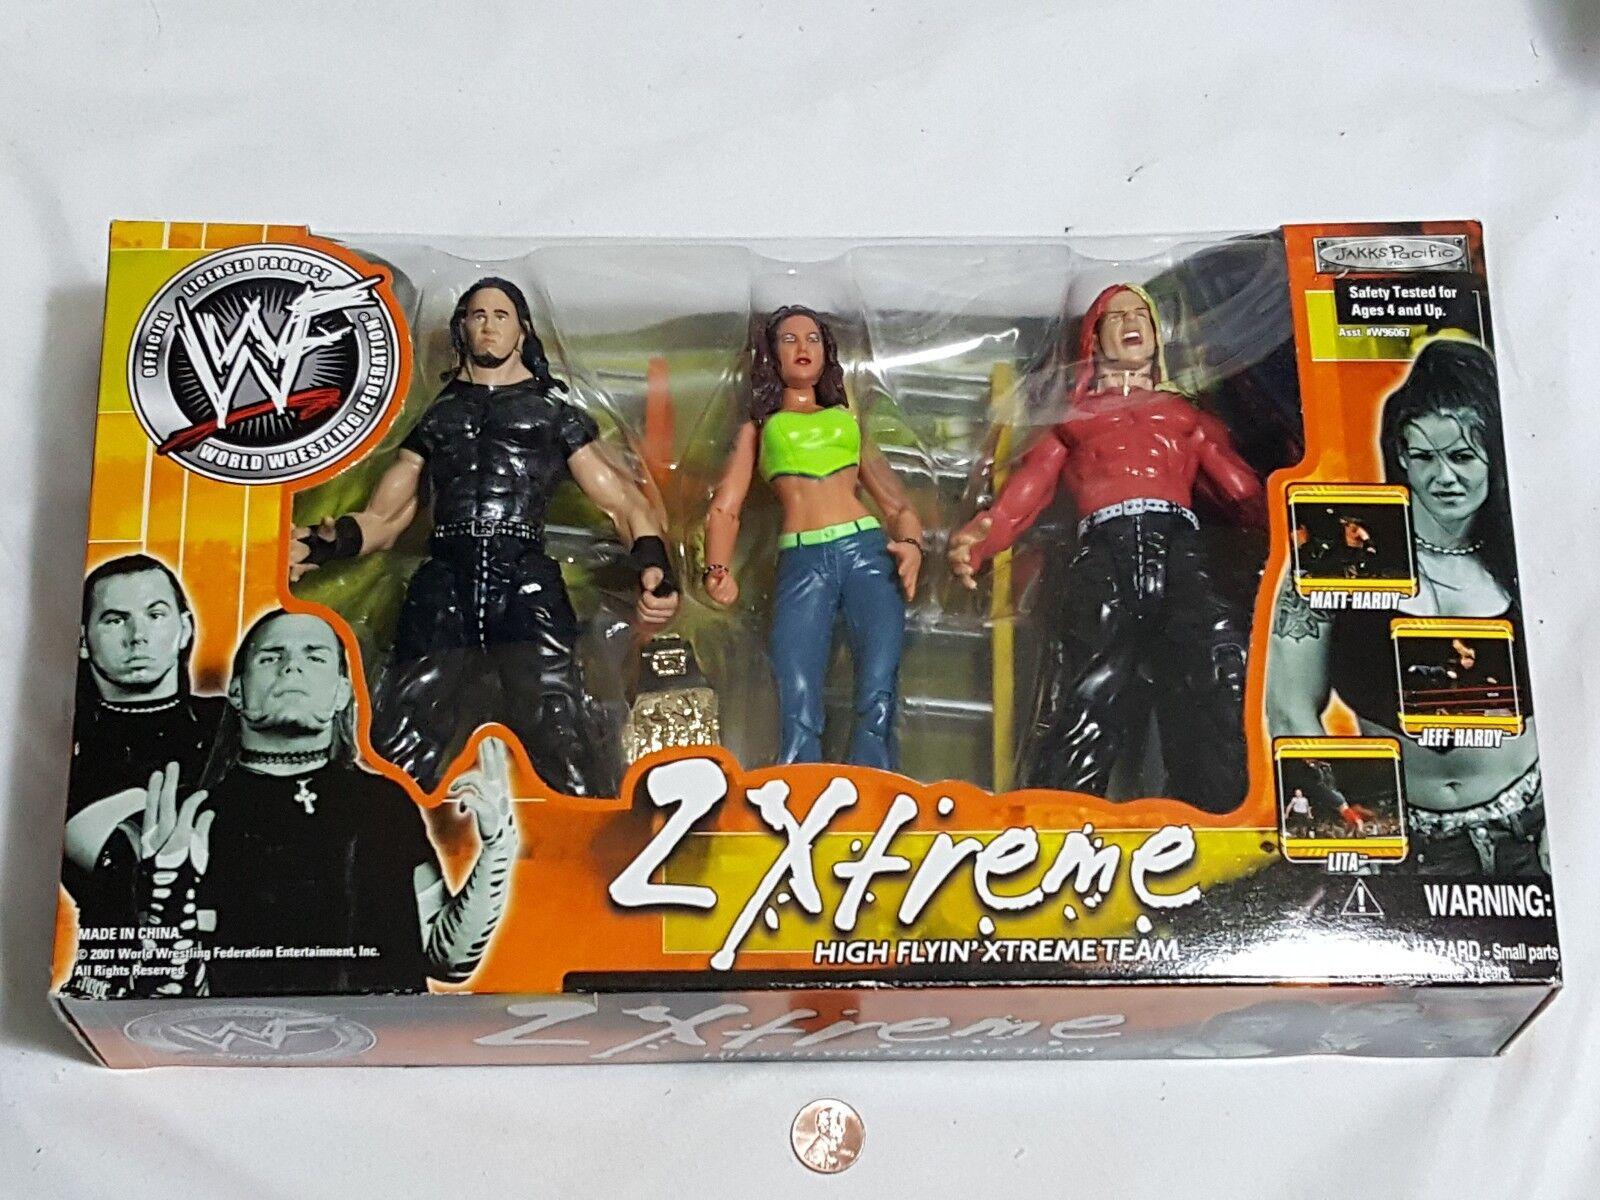 Nuevo WWF 2 Xtreme alta Flyin 'Xtreme equipo figuras Matt Jeff Hardy Lita Extreme